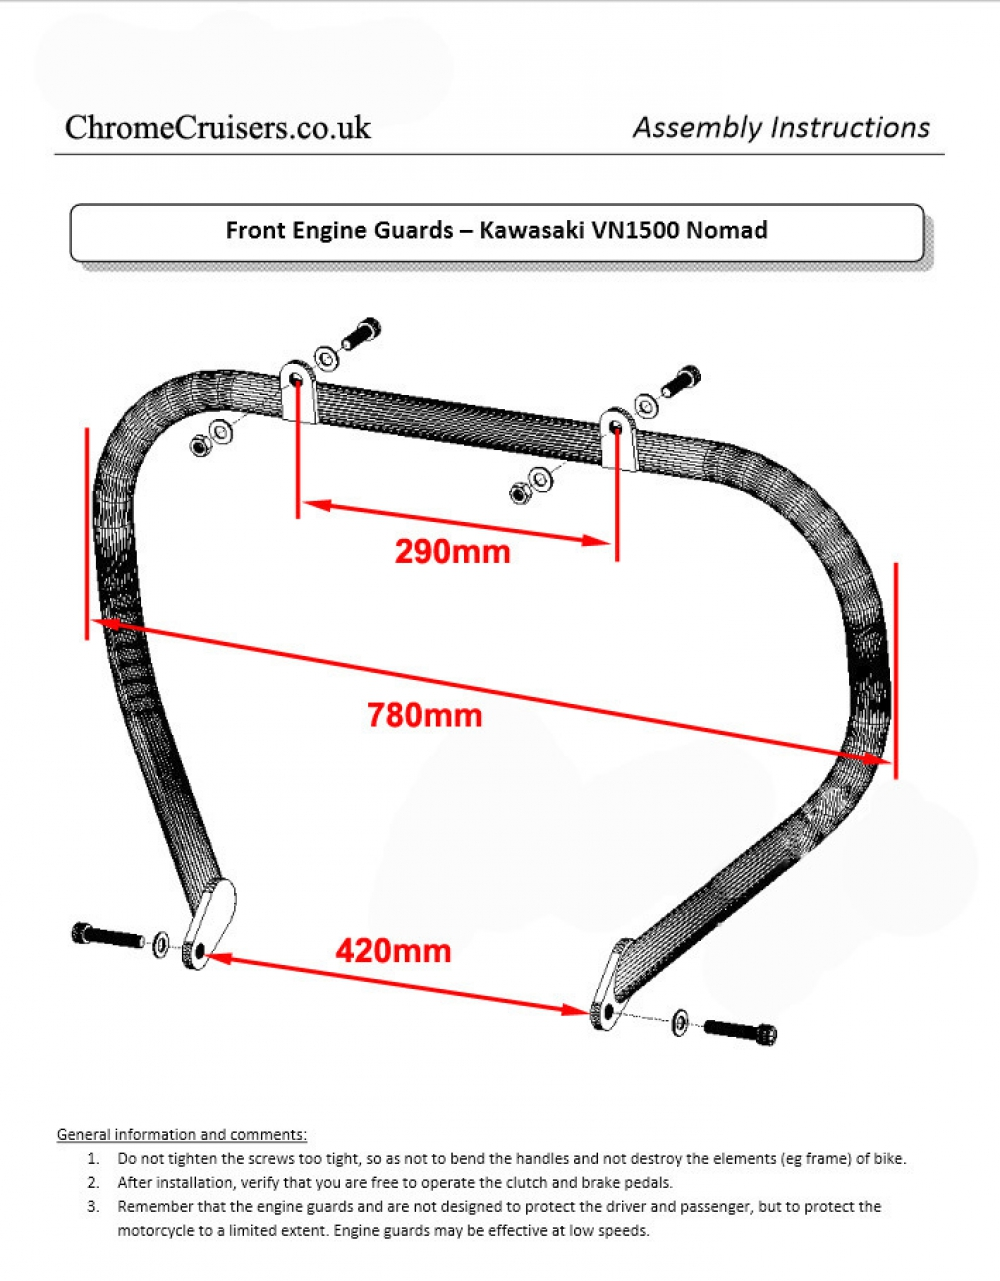 Kawasaki Vn1500 Vn 1500 Nomad Fi 2000 2006 Engine Guard Highway Wiring Schematic Heavy Duty Chrome Crash Bar